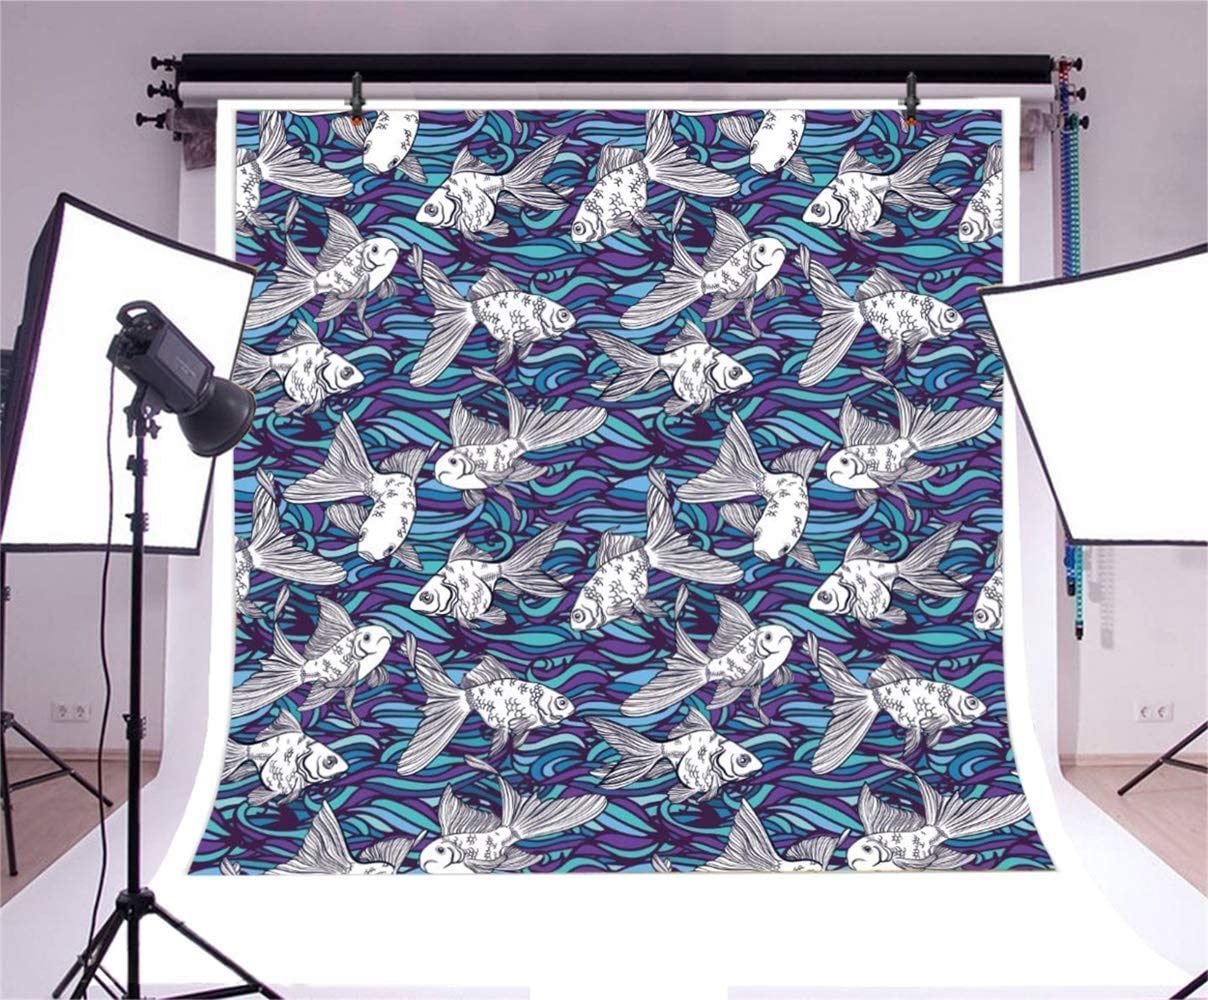 10x10ft Cartoon Plain Goldfish Blue Wave Illustration Vinyl Photography Background Novelty Backdrop Personal Artistic Portrait Shoot Living Room Decors Wallpaper Studio Props